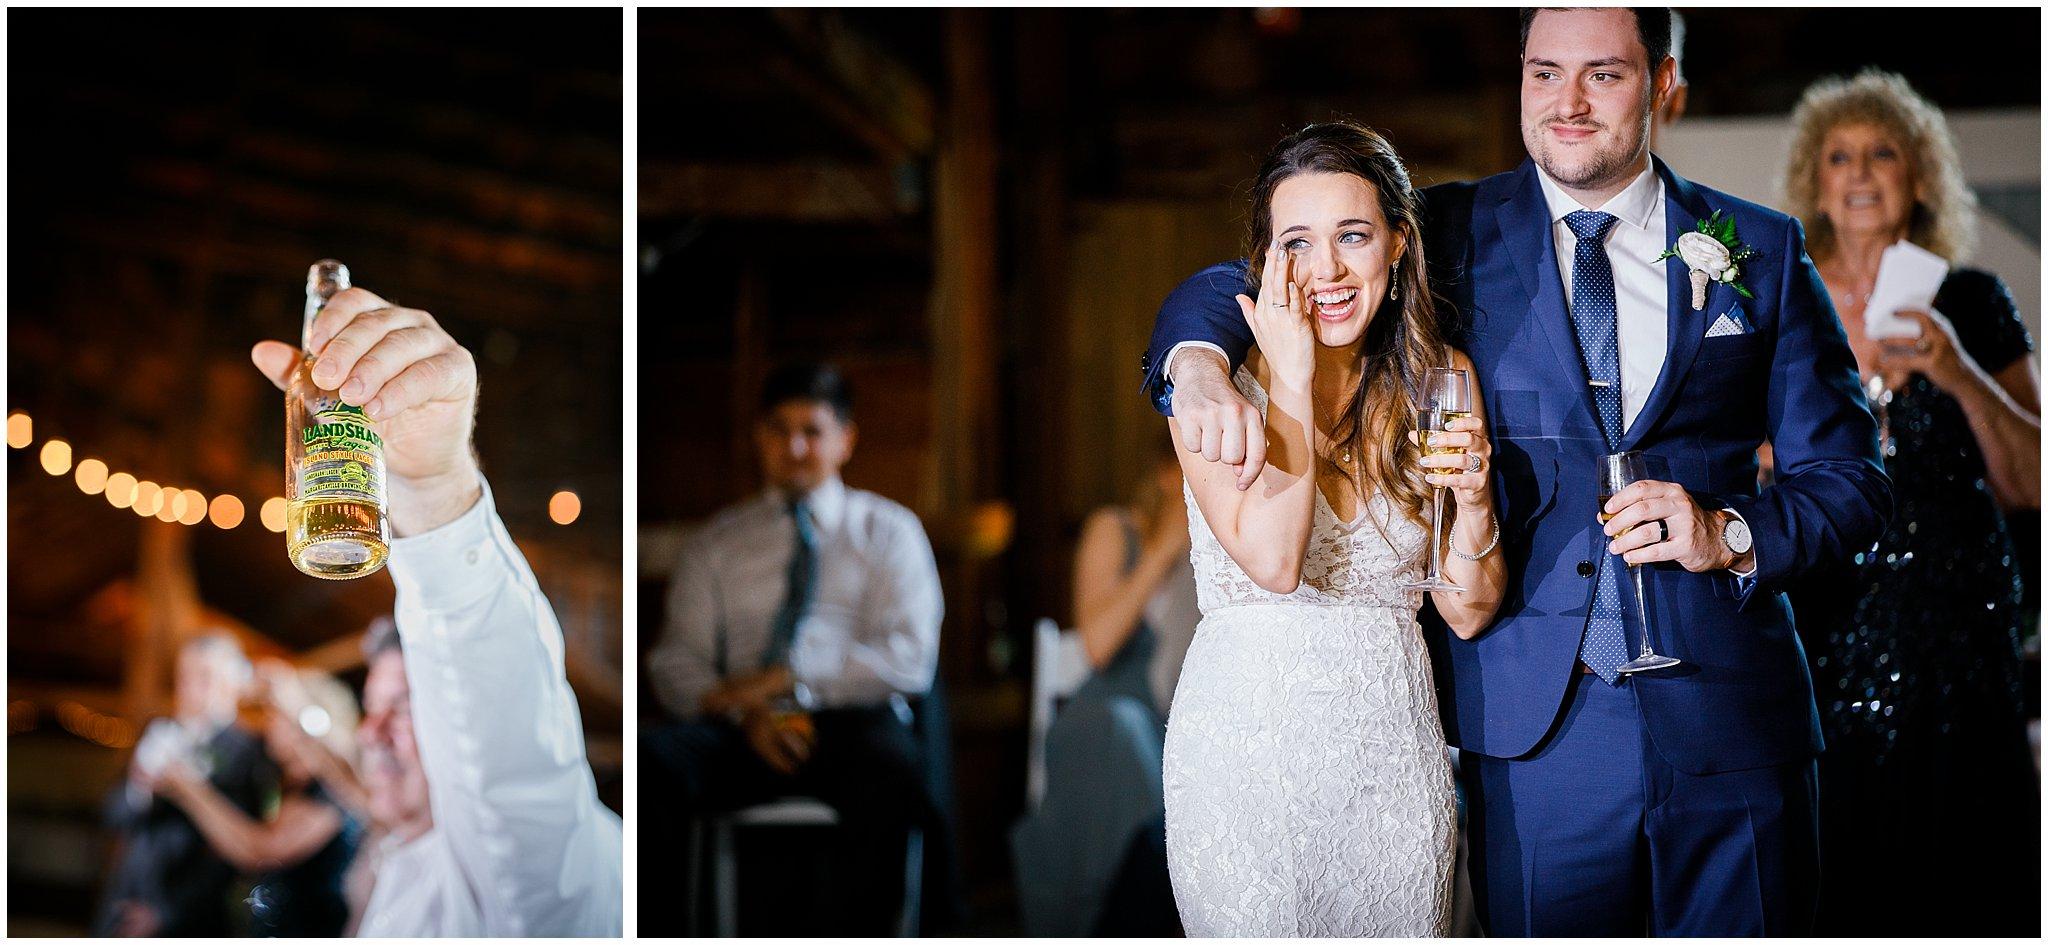 Hudson Valley Weddings at the Hill Hudson New York Wedding Photographer91.jpg